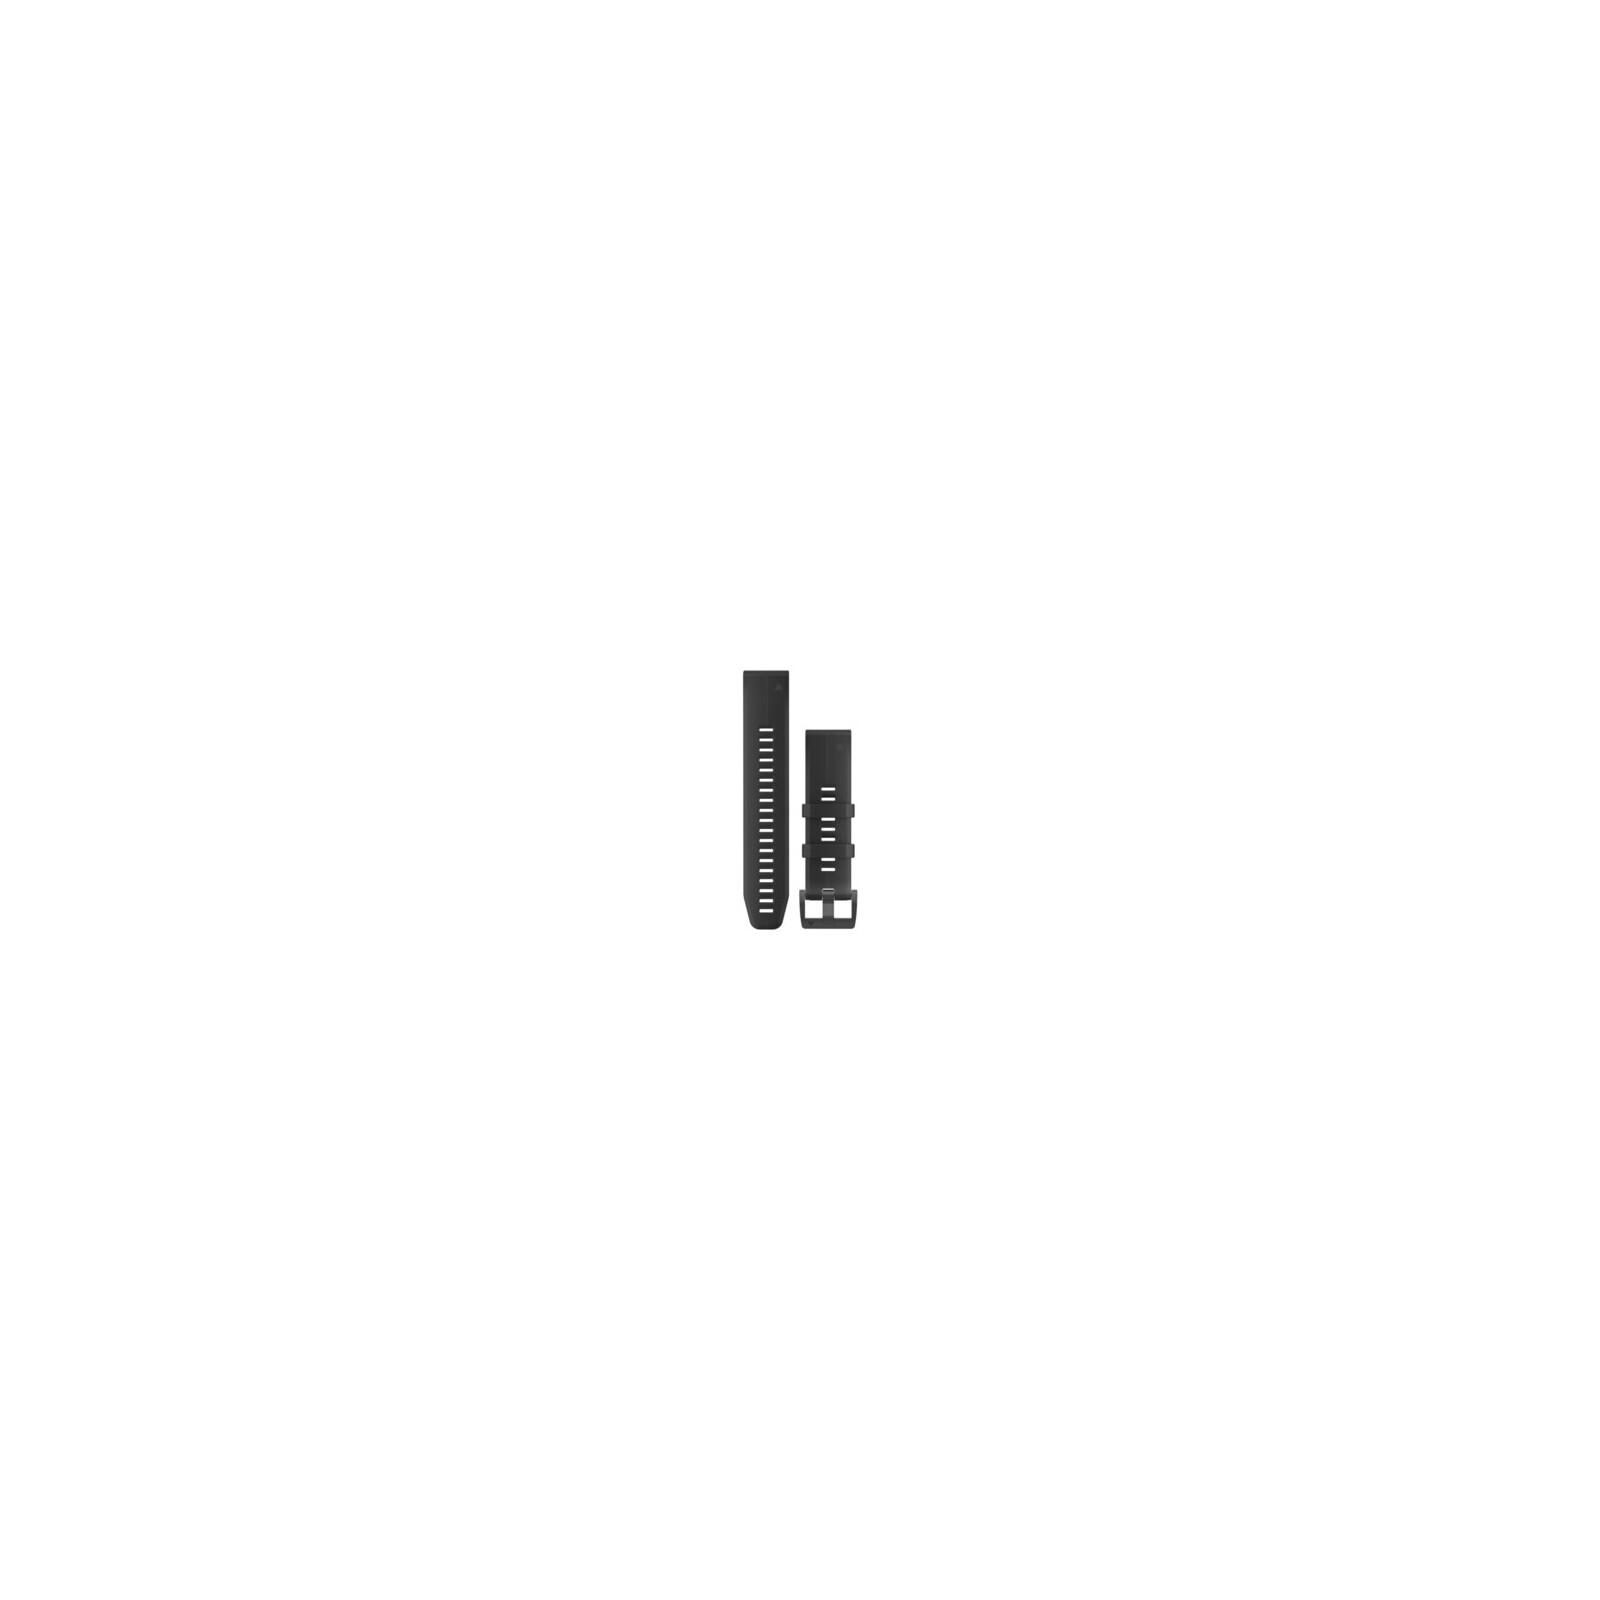 Garmin QuickFit 22 Uhrenband Silikon Schwarz/Schwarz